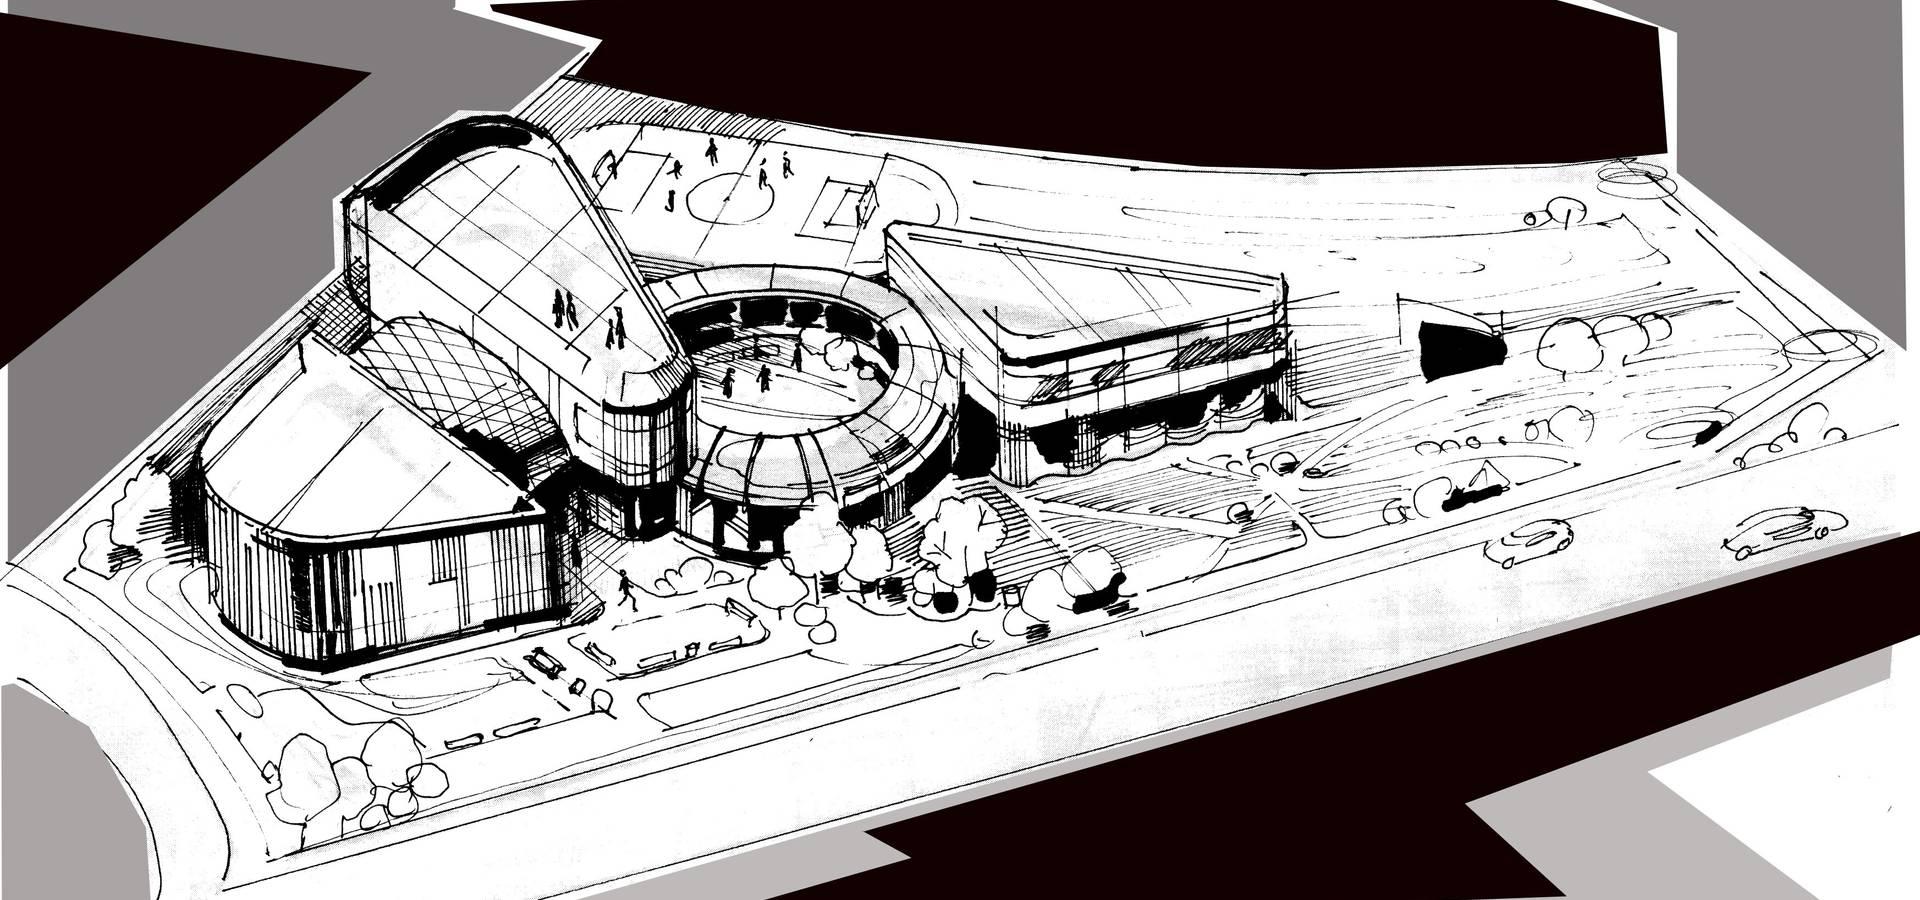 BCG Architects